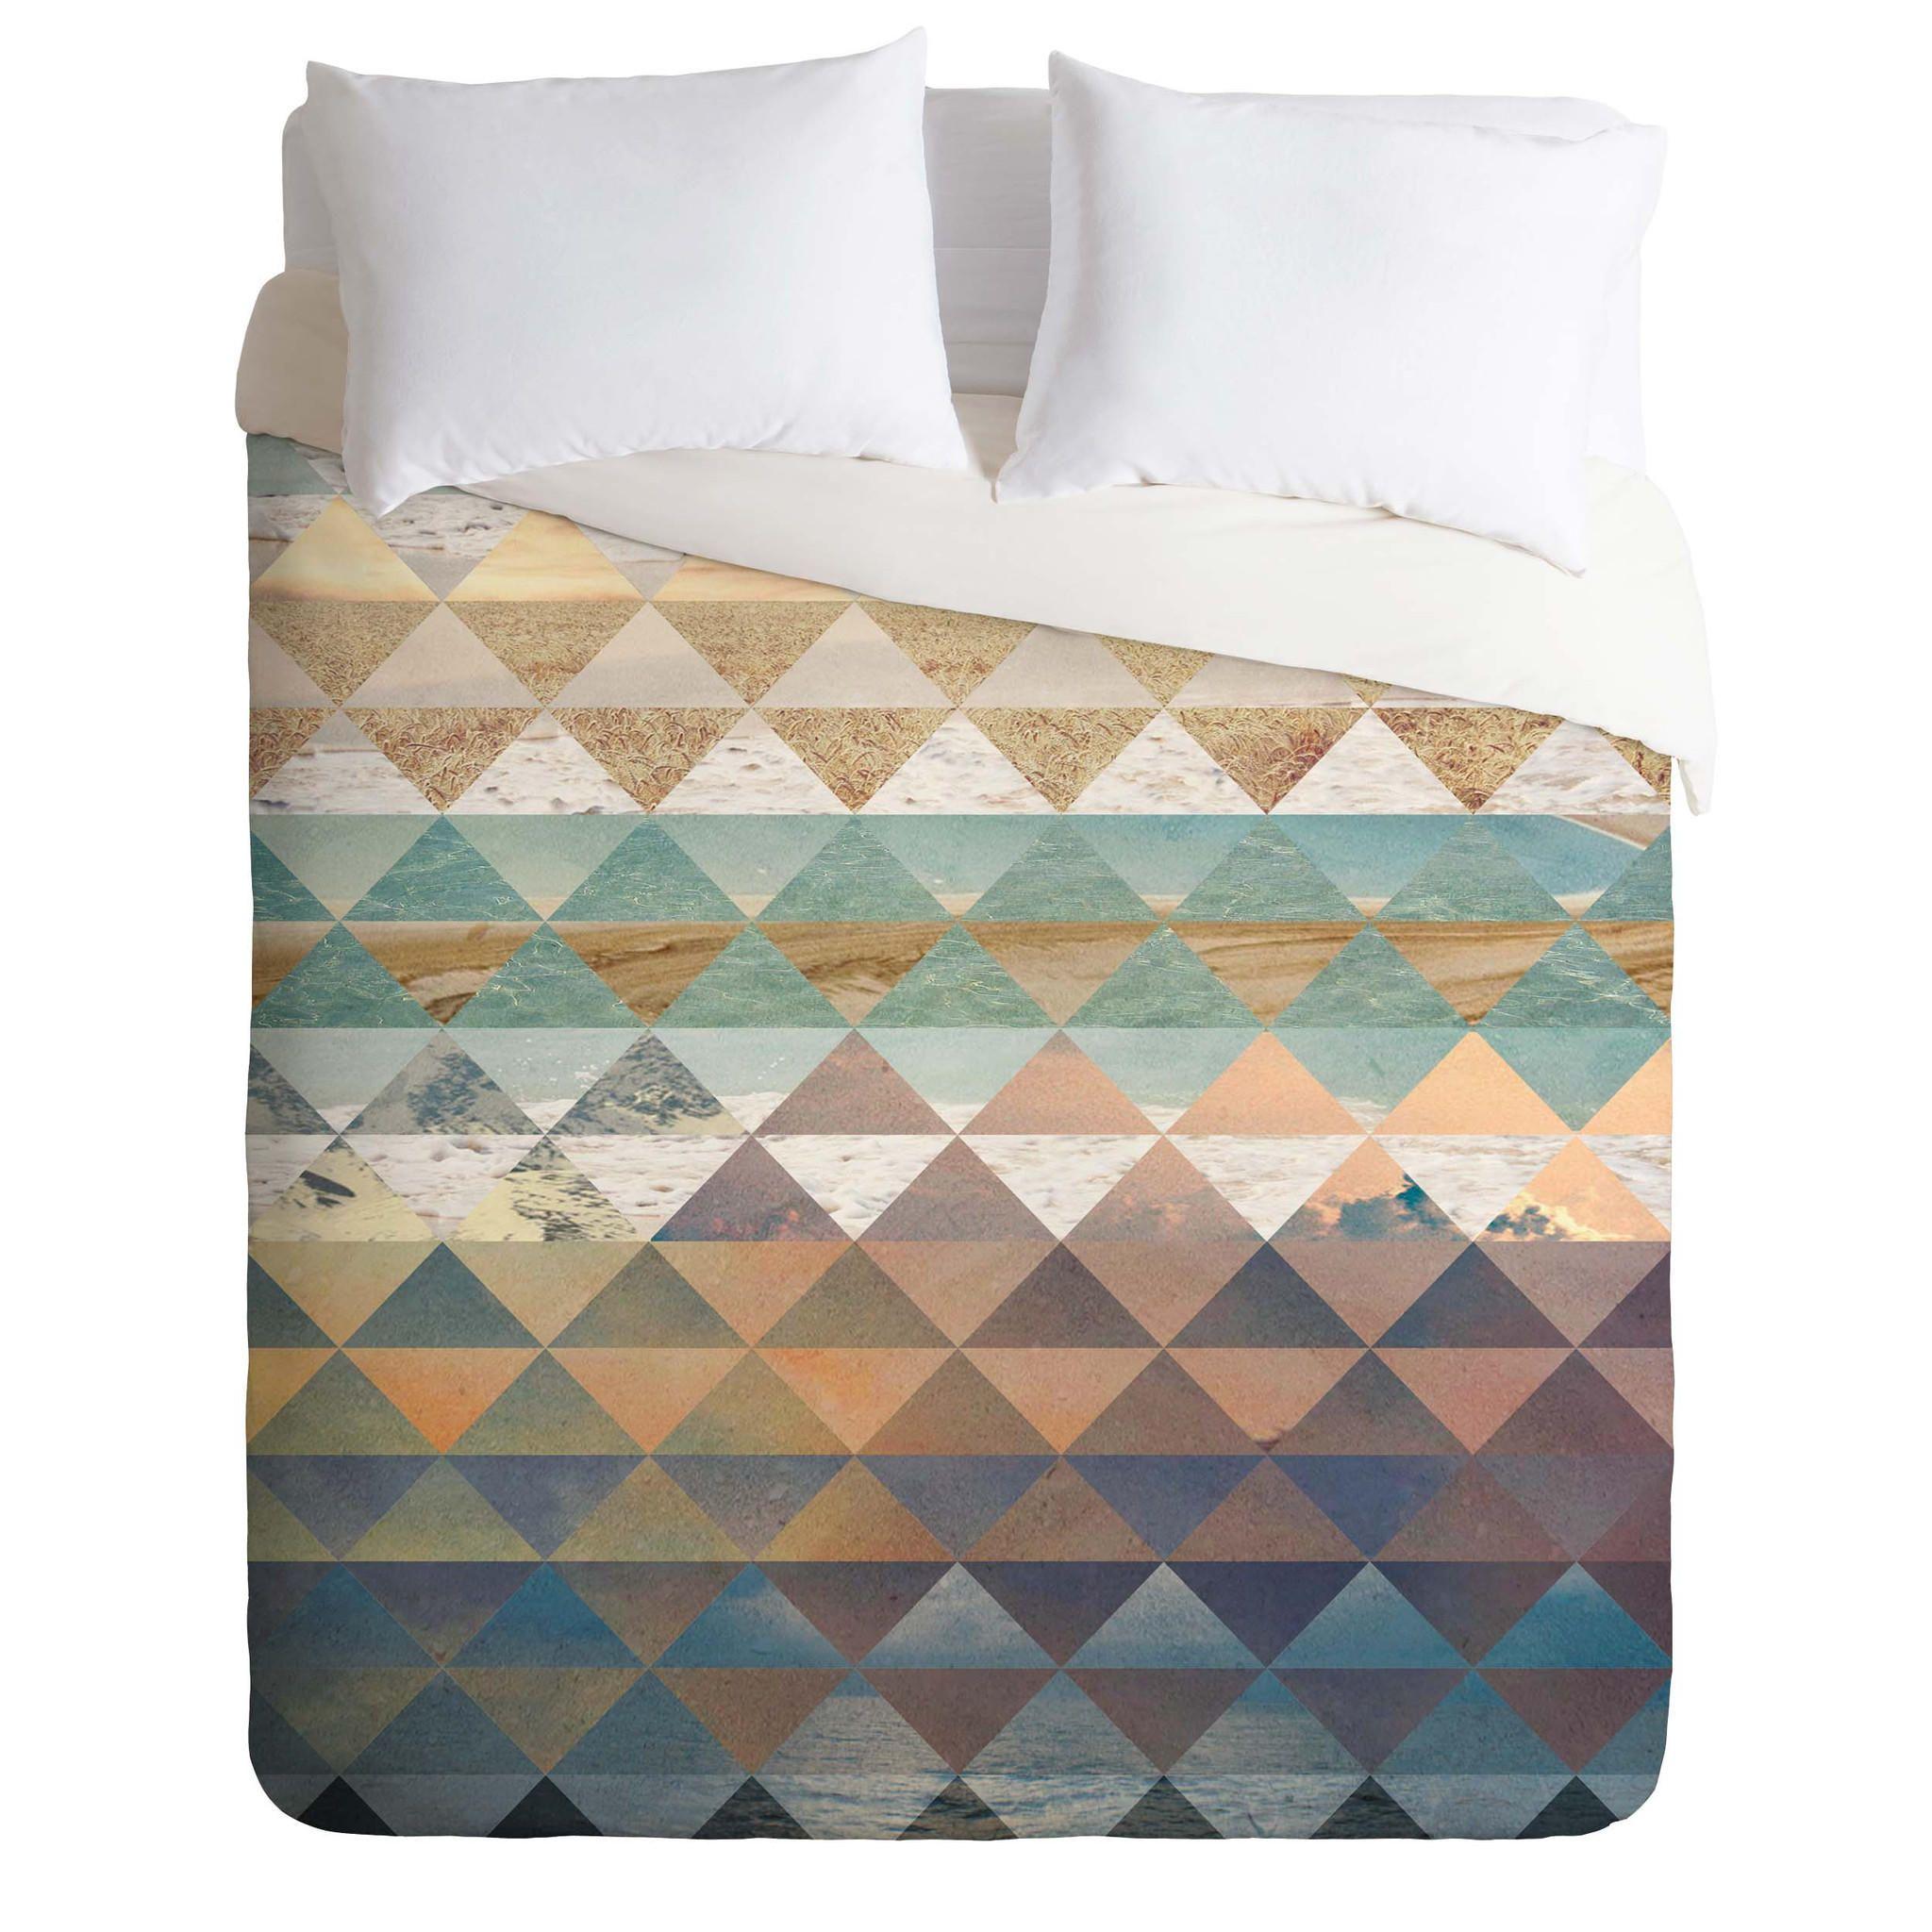 Kei Ibrox Duvet Cover from DENY Designs. Saved to DENY Designs Duvet Covers. #bedroom #bedding #decor #home #beach #geometric.